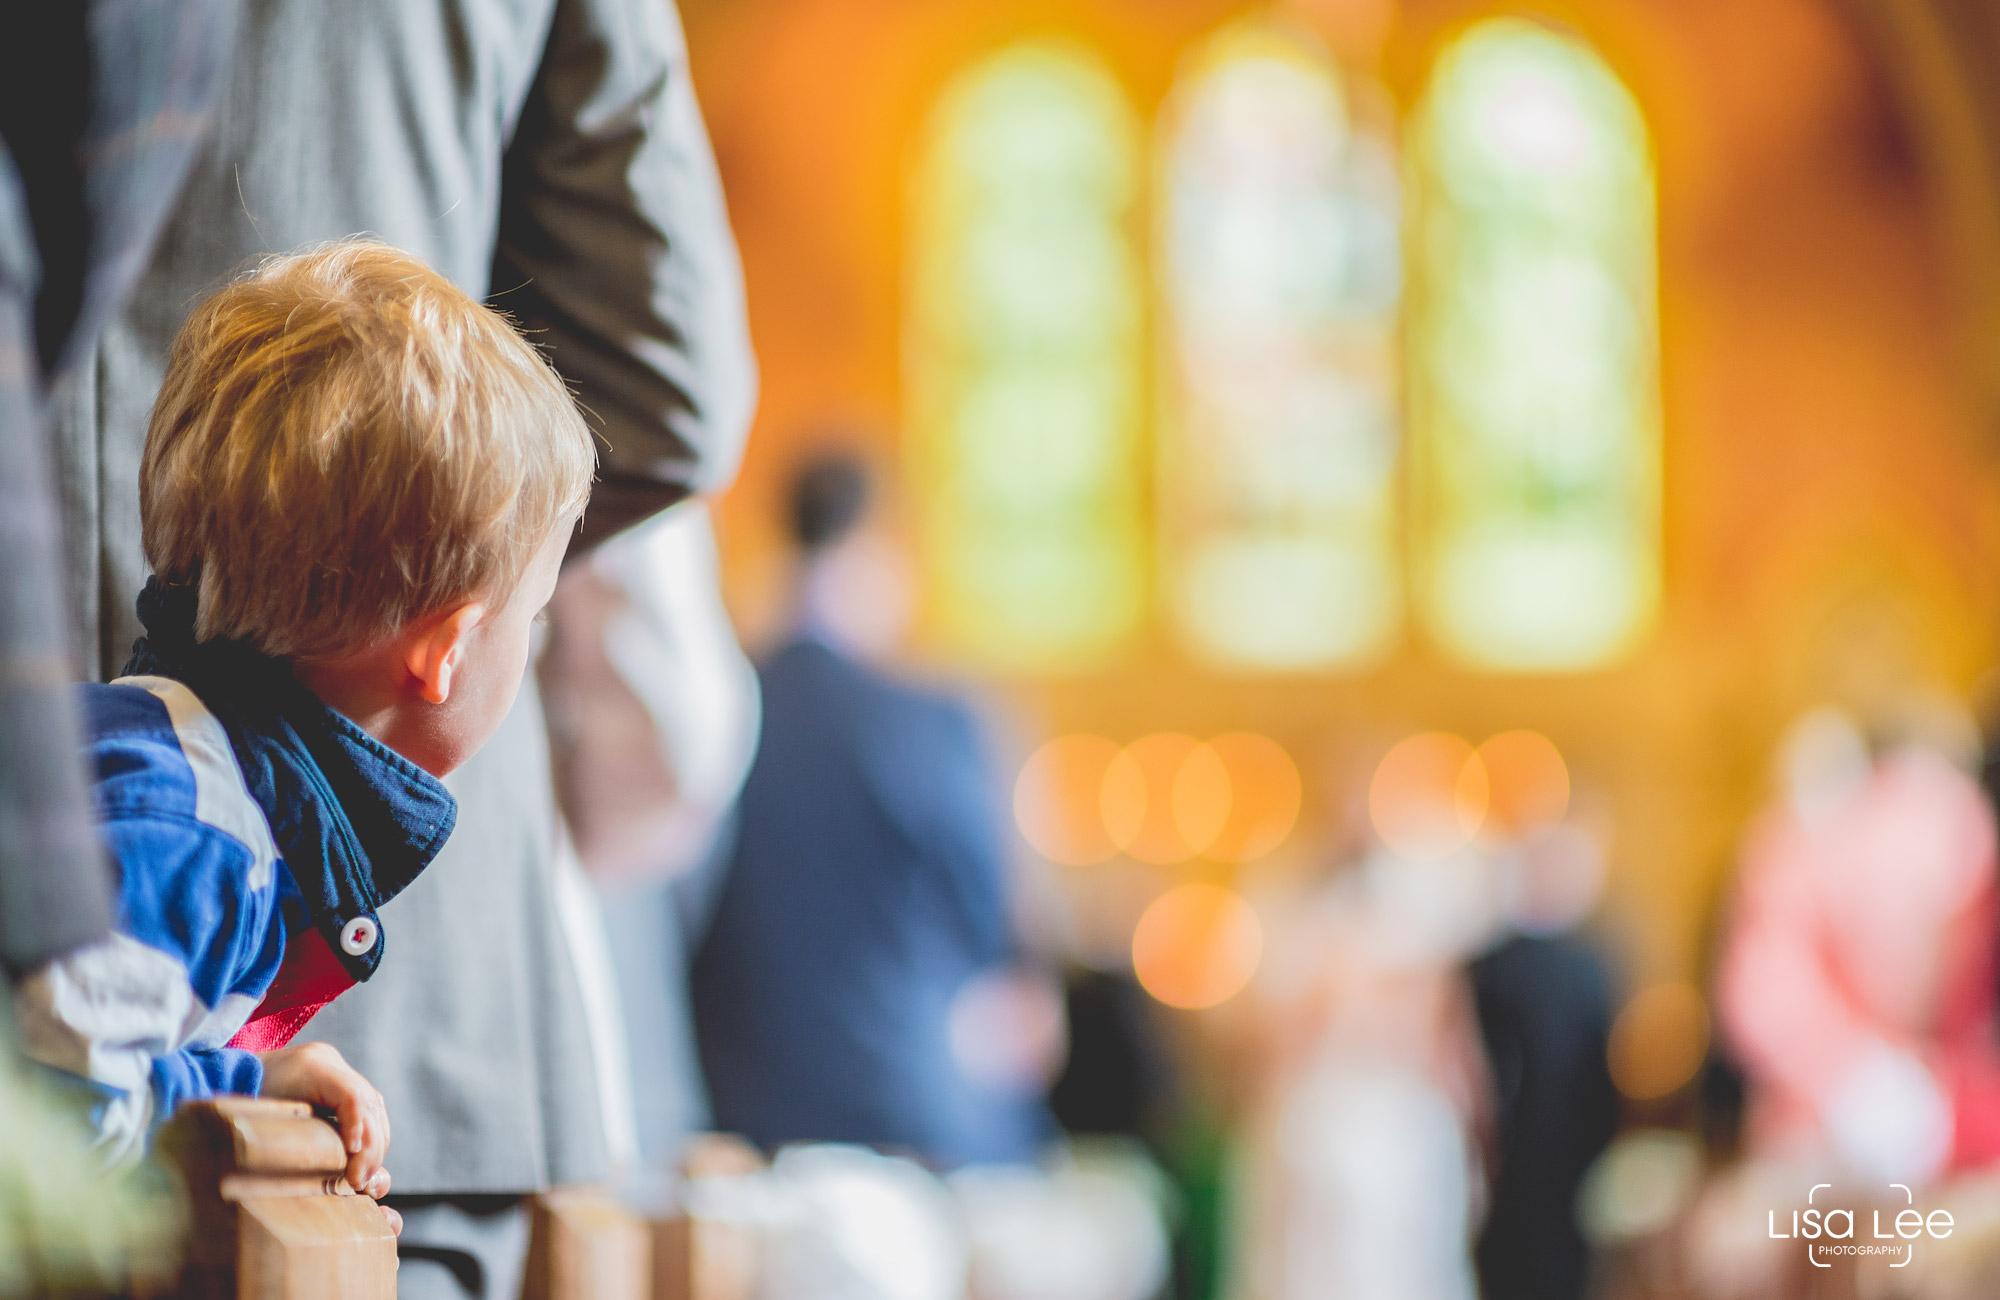 lisa-lee-wedding-photography-burton-kidchurch.jpg